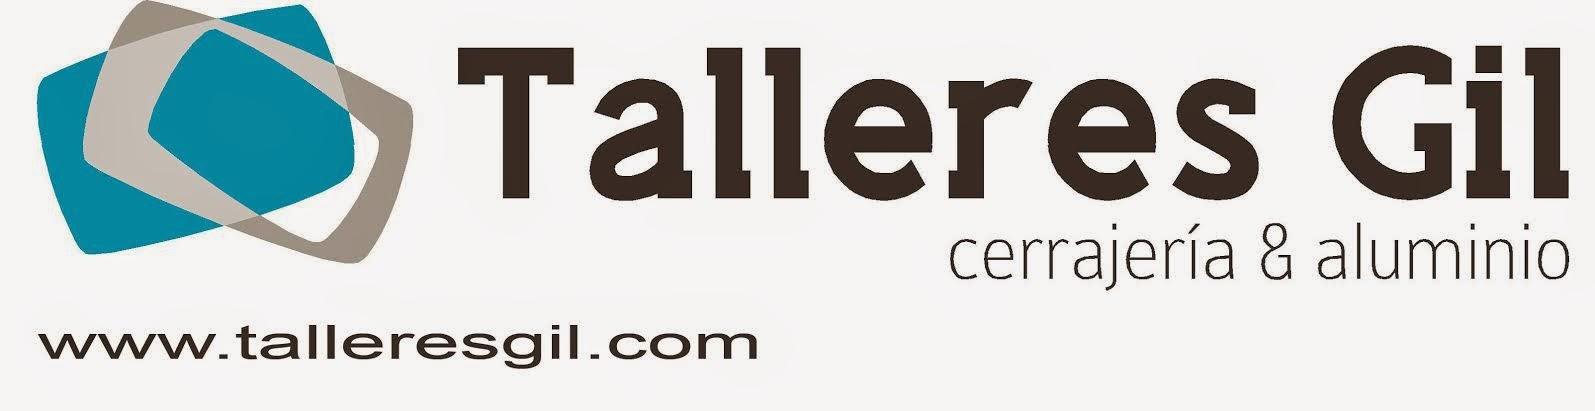 TALLERES GIL